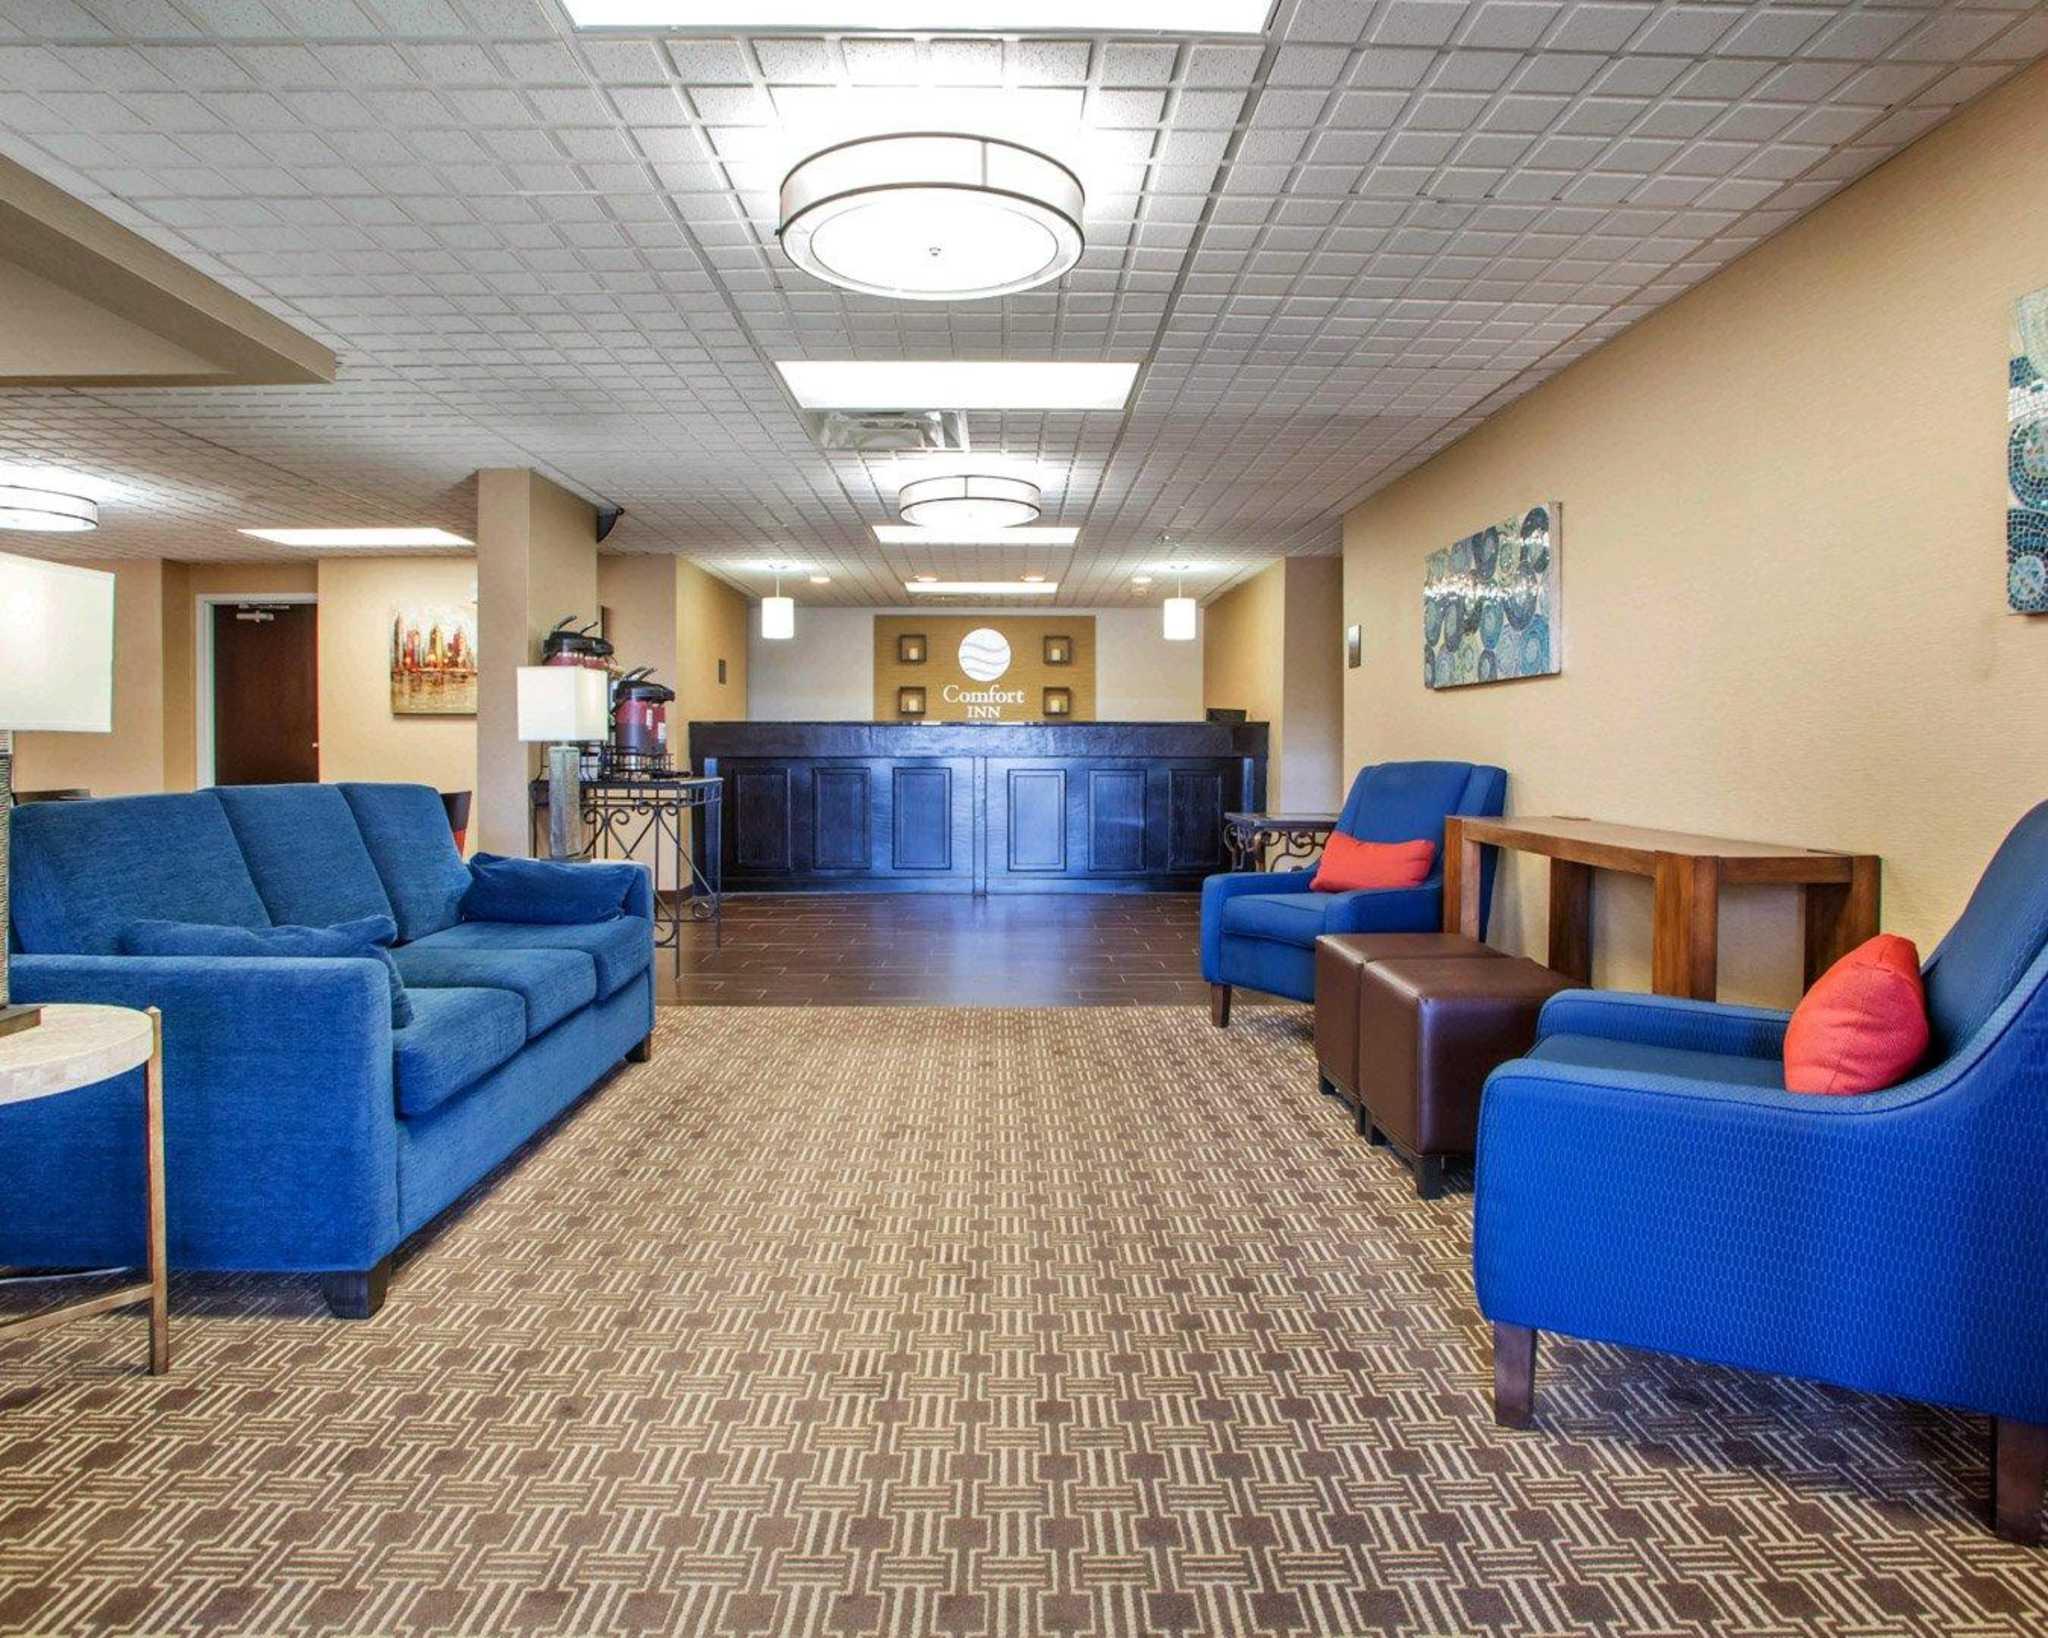 Comfort Inn Dayton - Huber Heights image 16